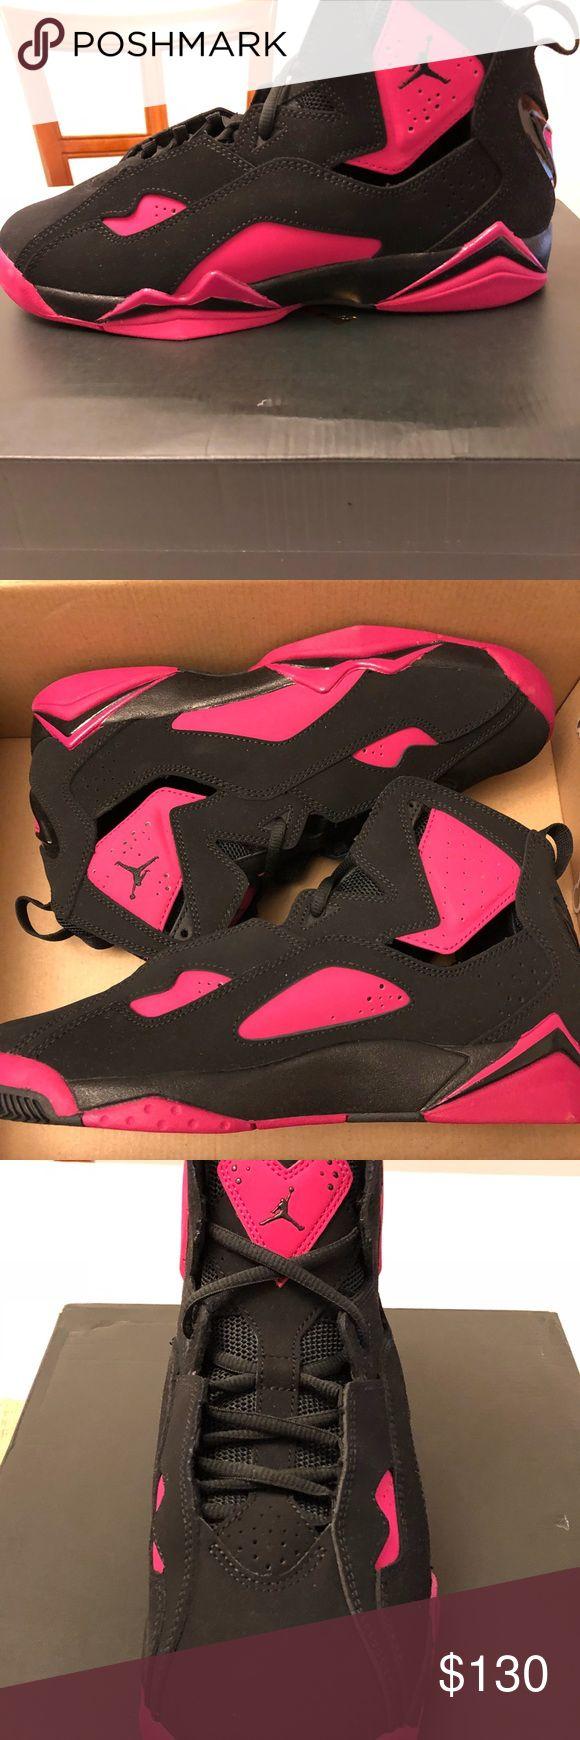 Jordan True Flight GG Size 8.5 Jordan True Flight GG Size 8.5 Air Jordan Shoes Sneakers